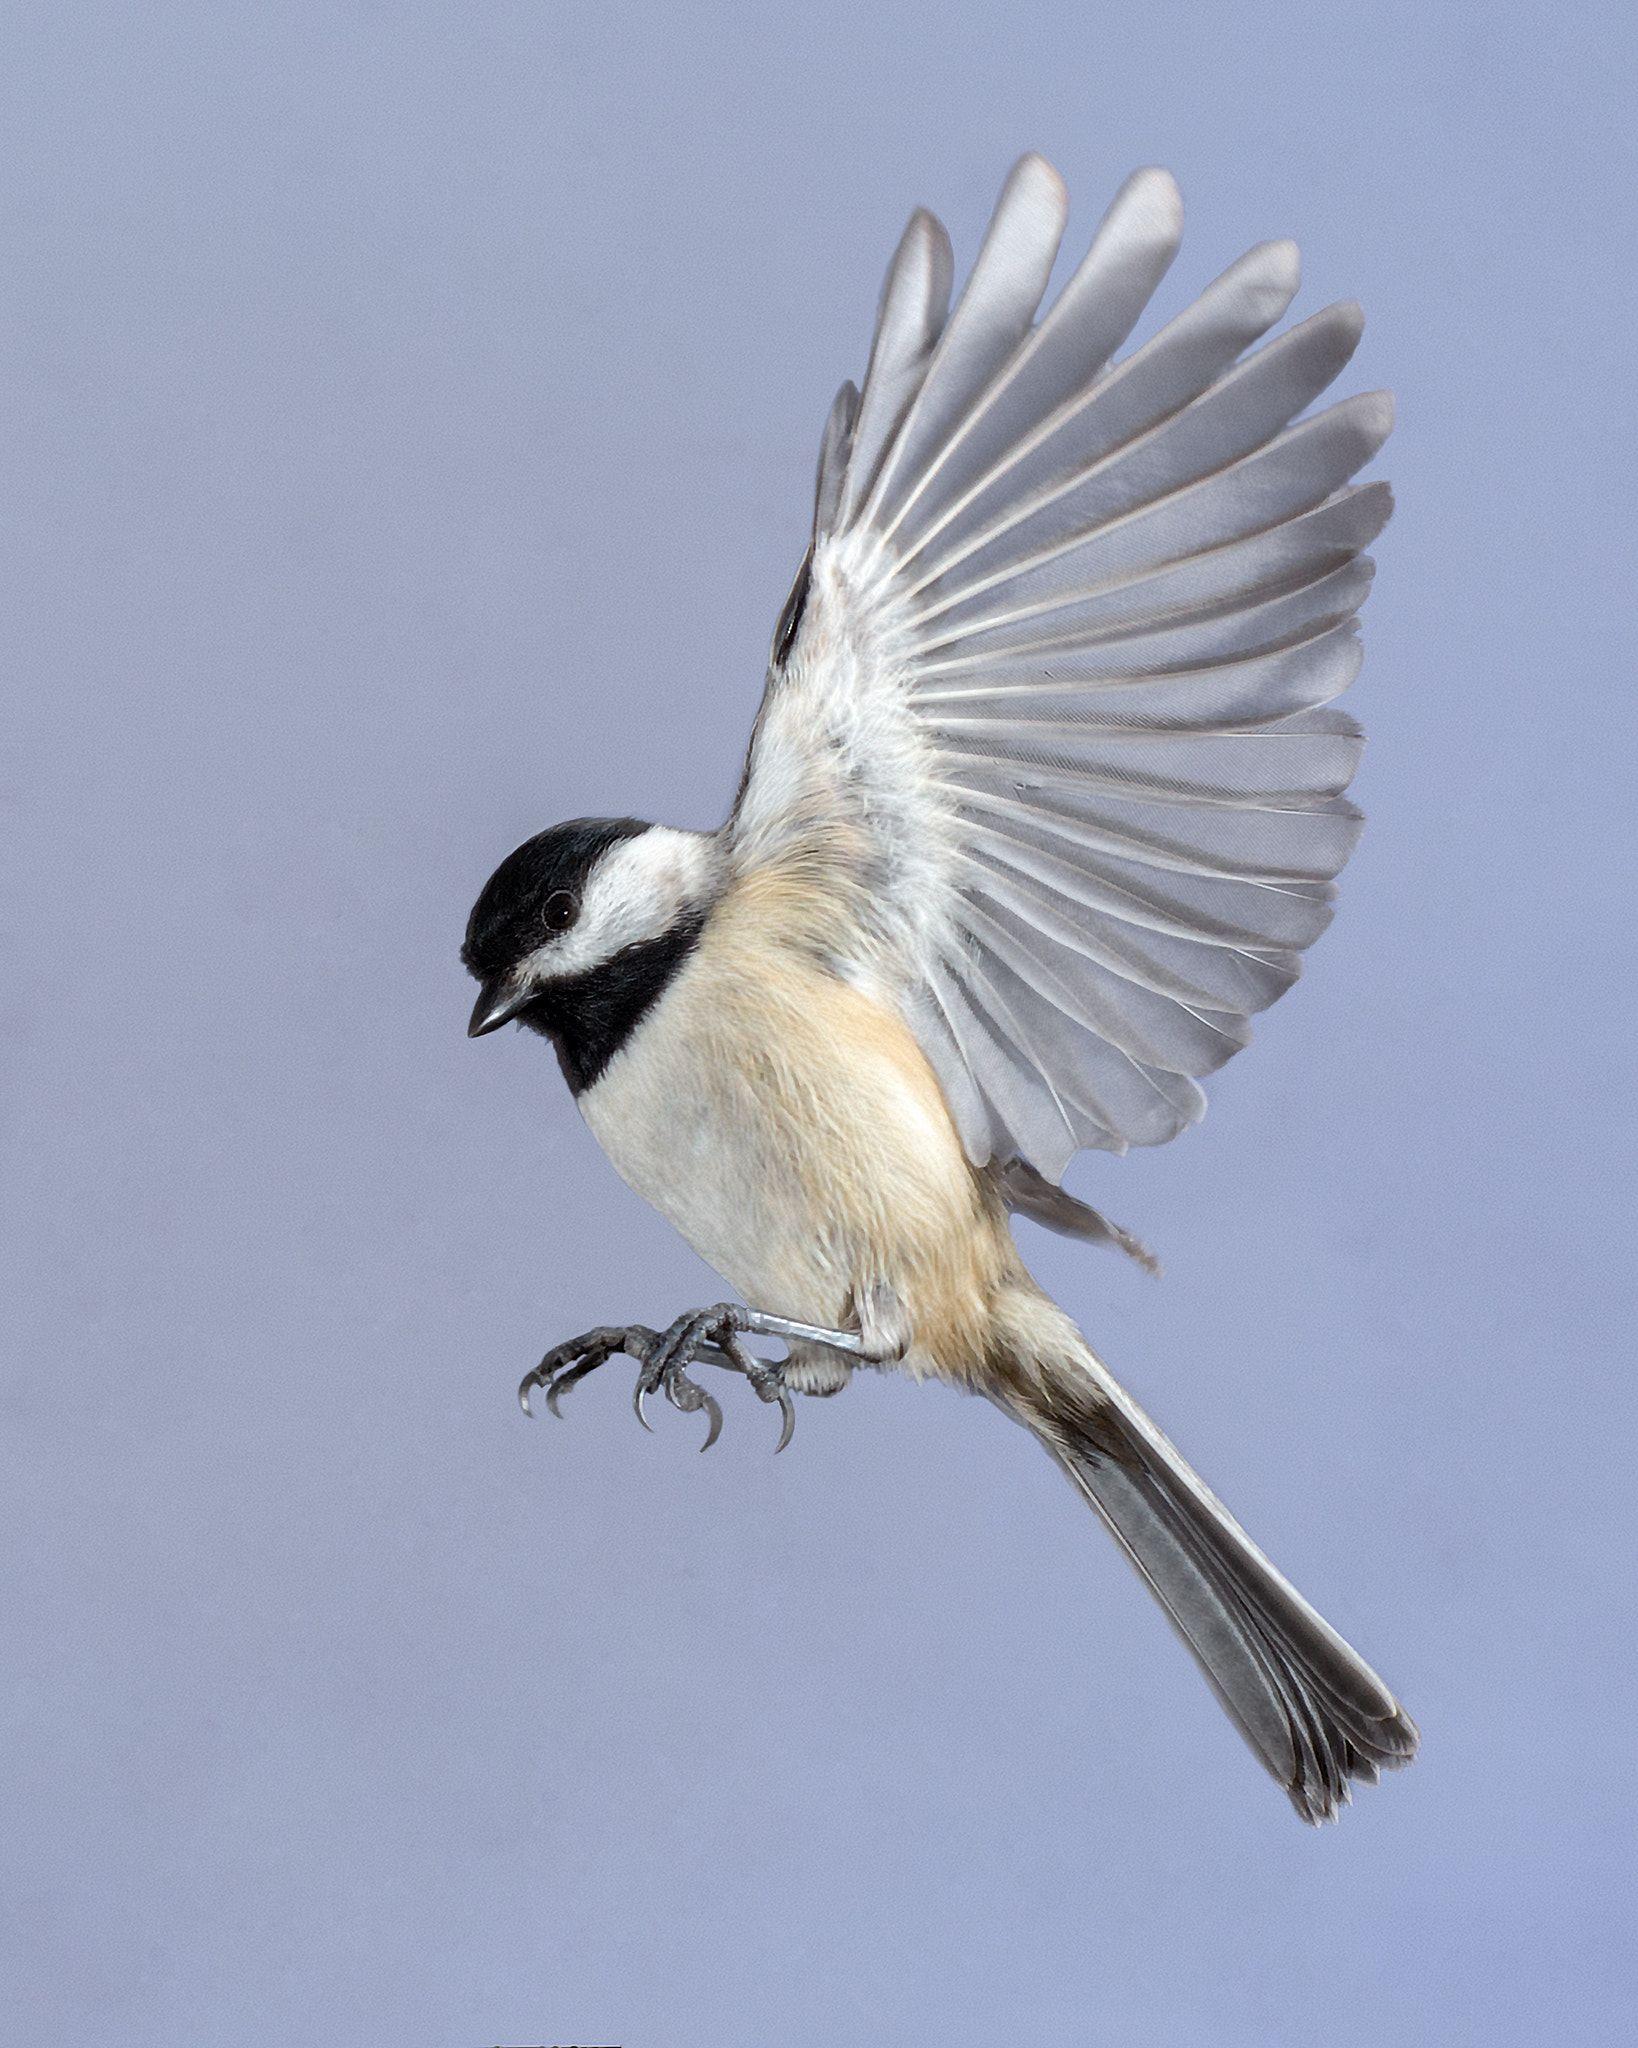 A chickadee often follows Loa around - - #Chickadee #Loa ... - photo#3